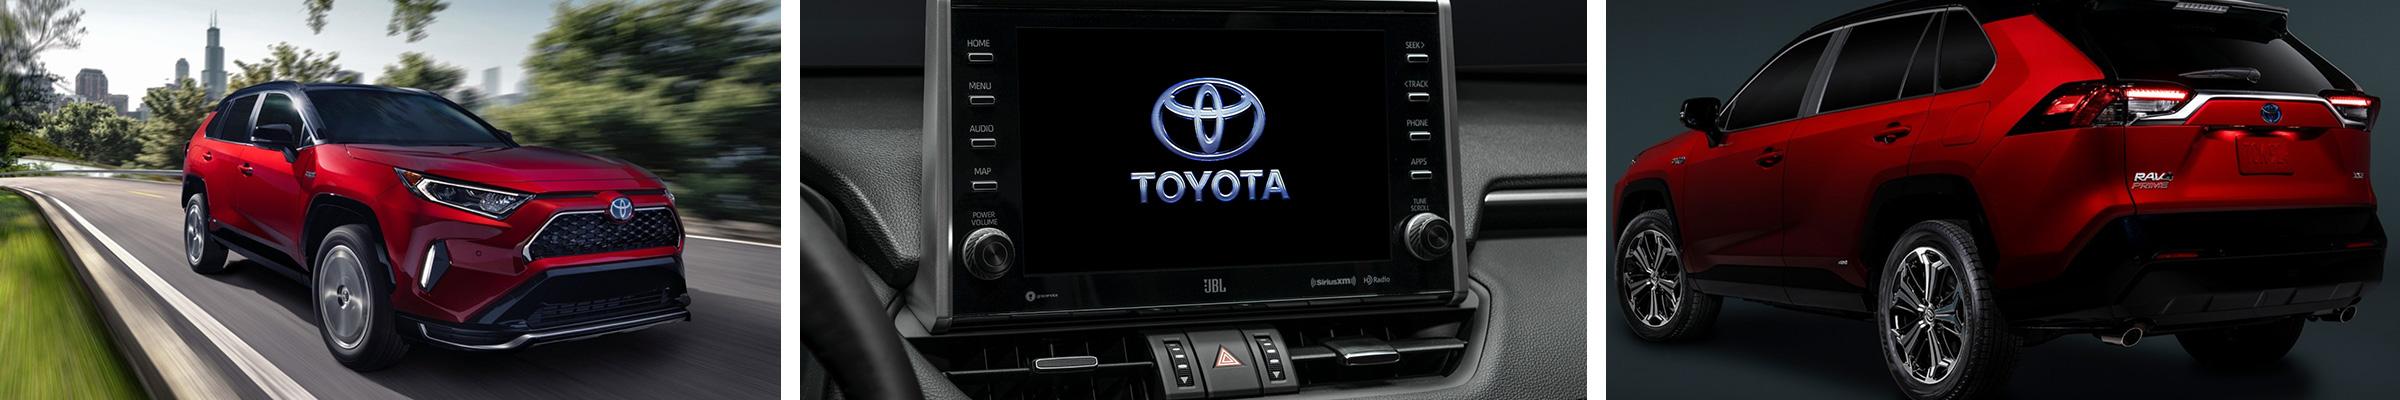 2021 Toyota RAV4 Prime For Sale Savannah GA | Chatham County